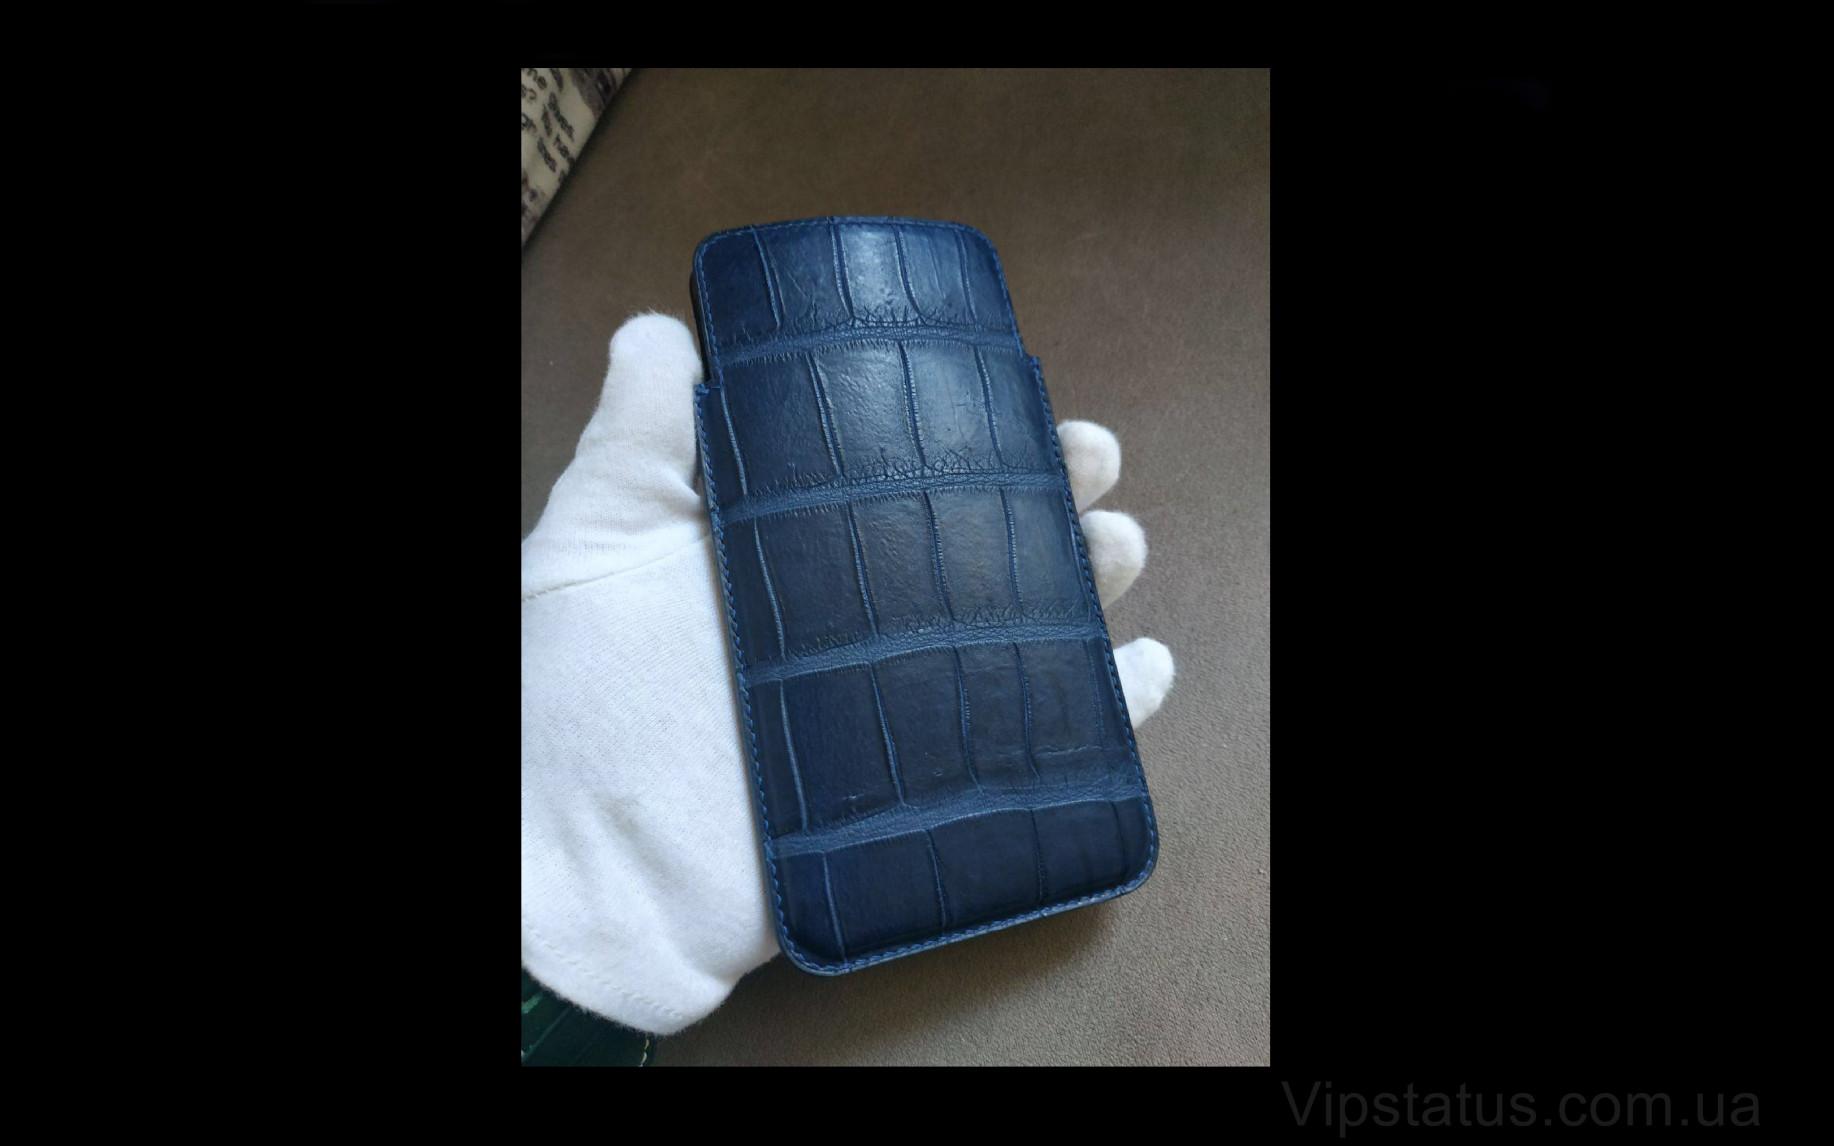 Elite Blue Style Эксклюзивный кейс IPhone 11 12 Pro Max Blue Style Exclusive case IPhone 11 12 Pro Max Crocodile leather image 1